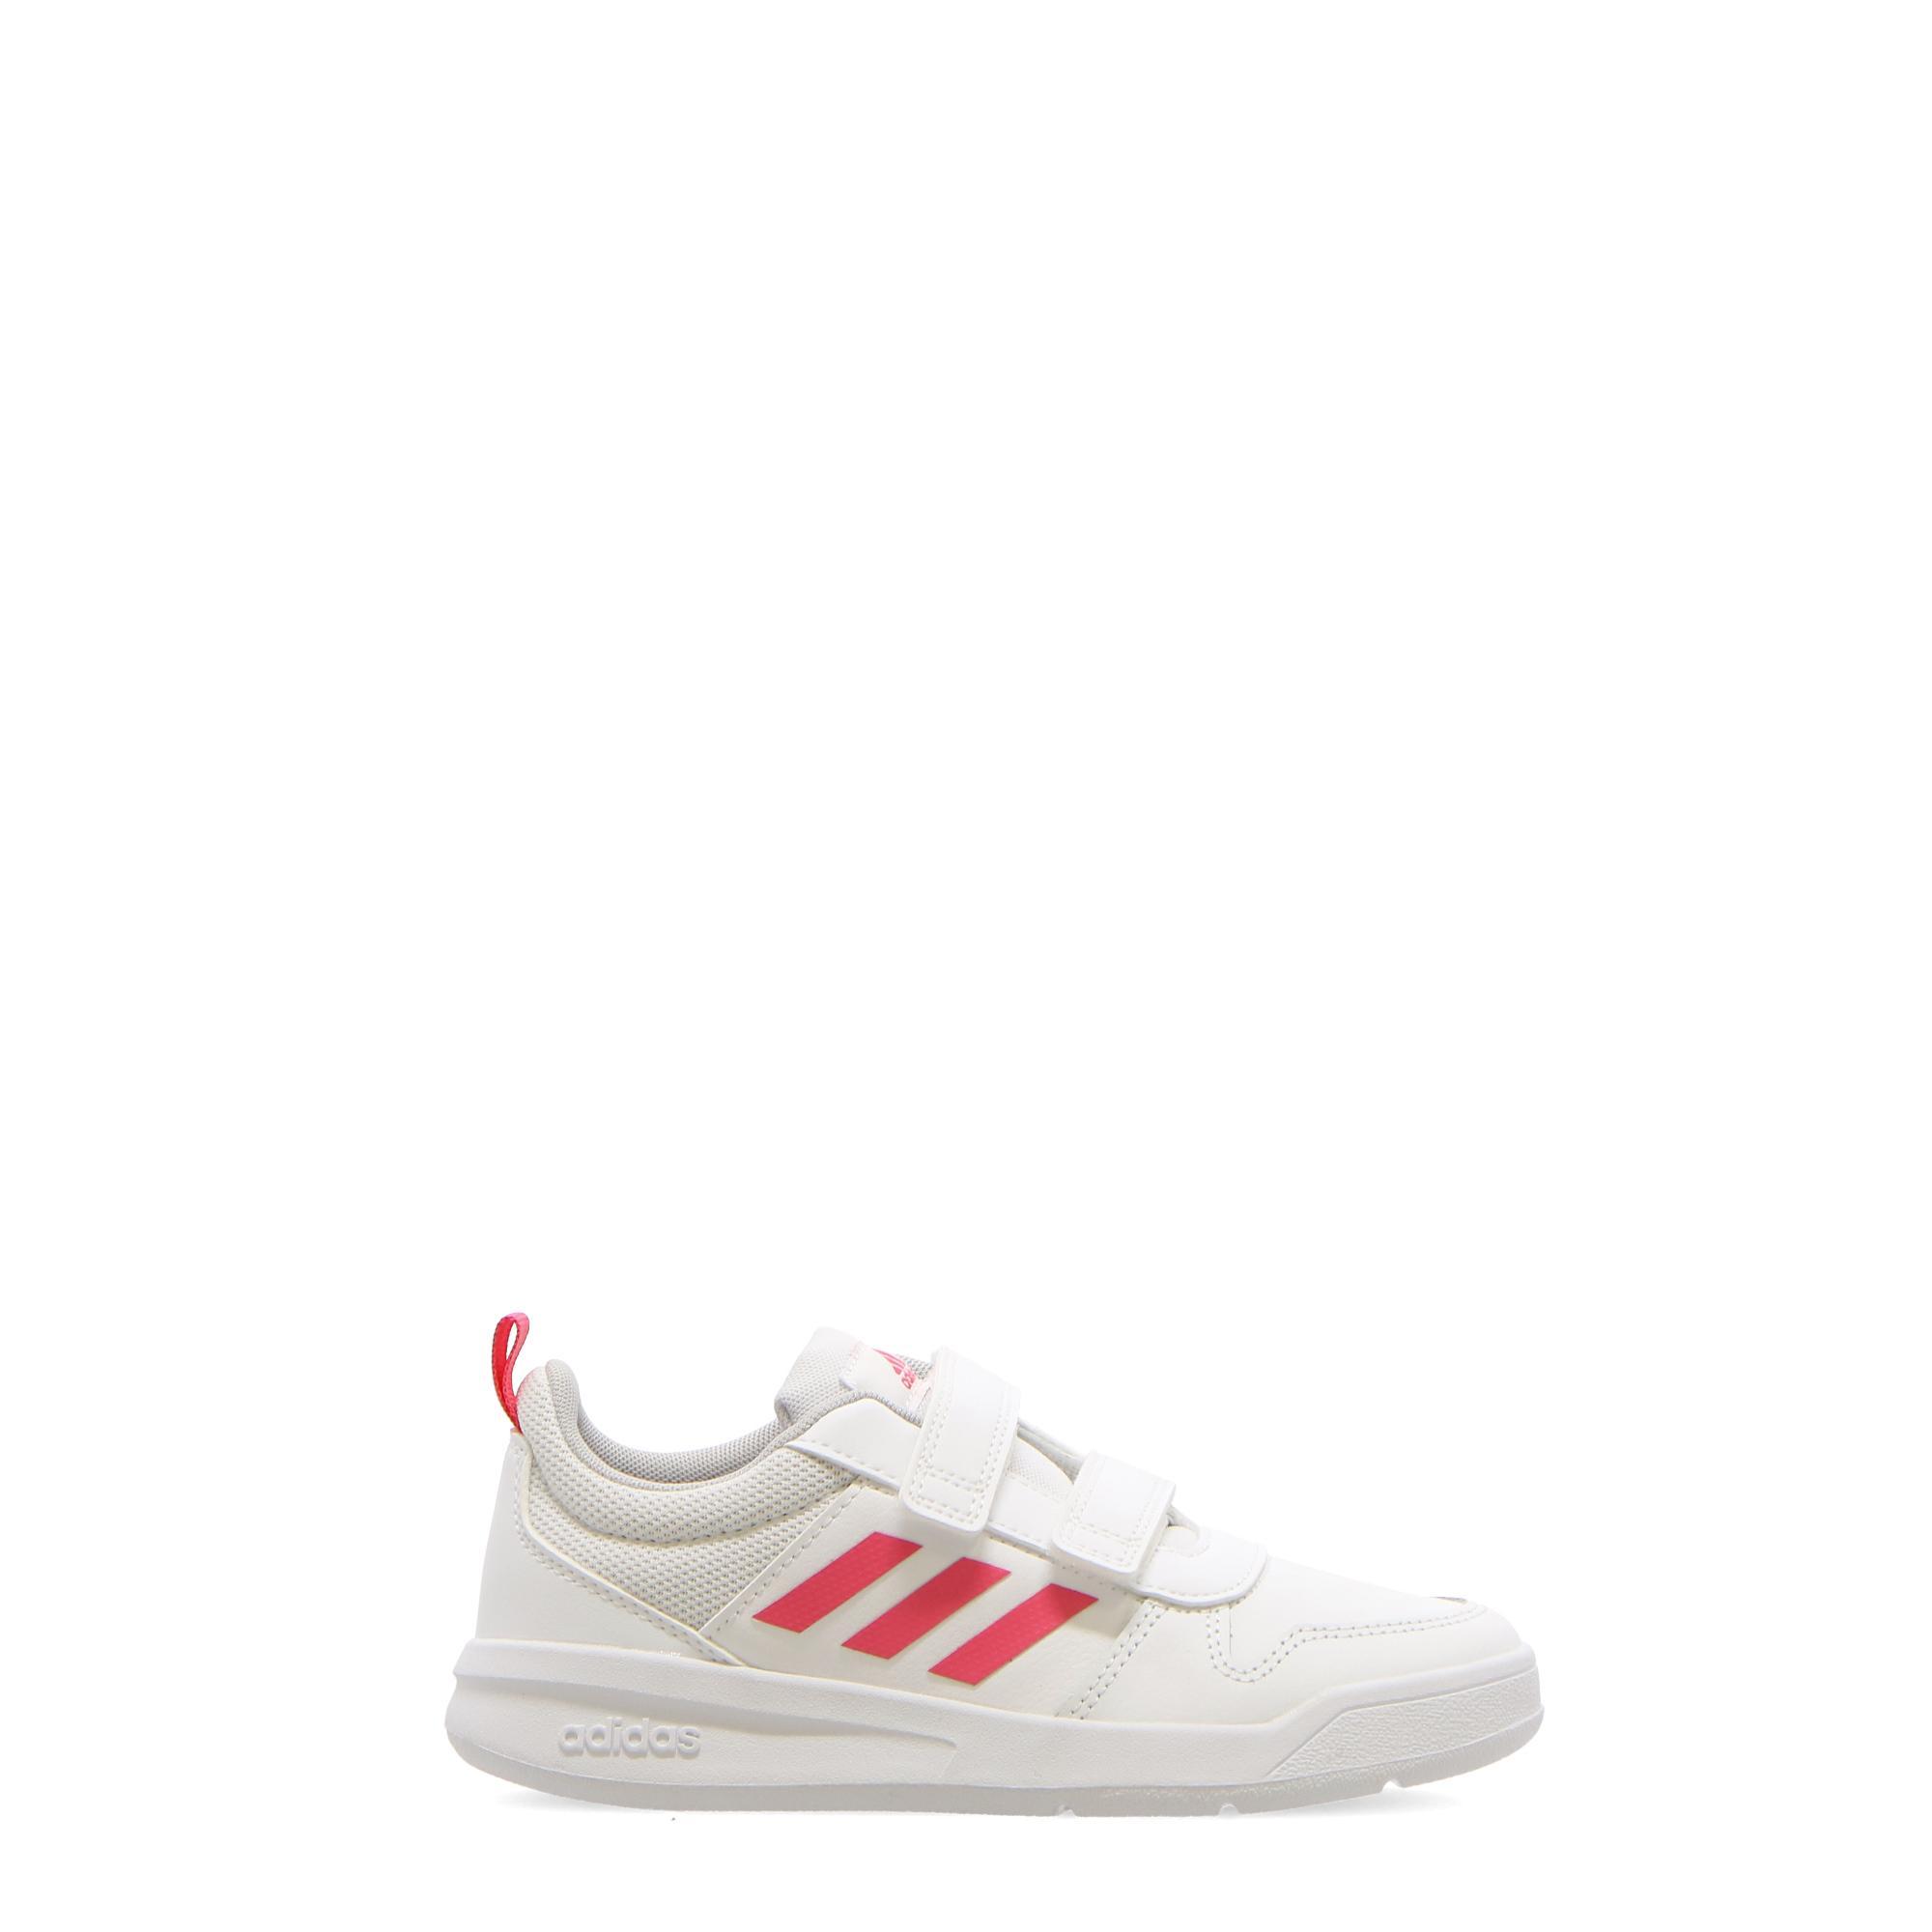 Adidas Tensaur C White real pink white